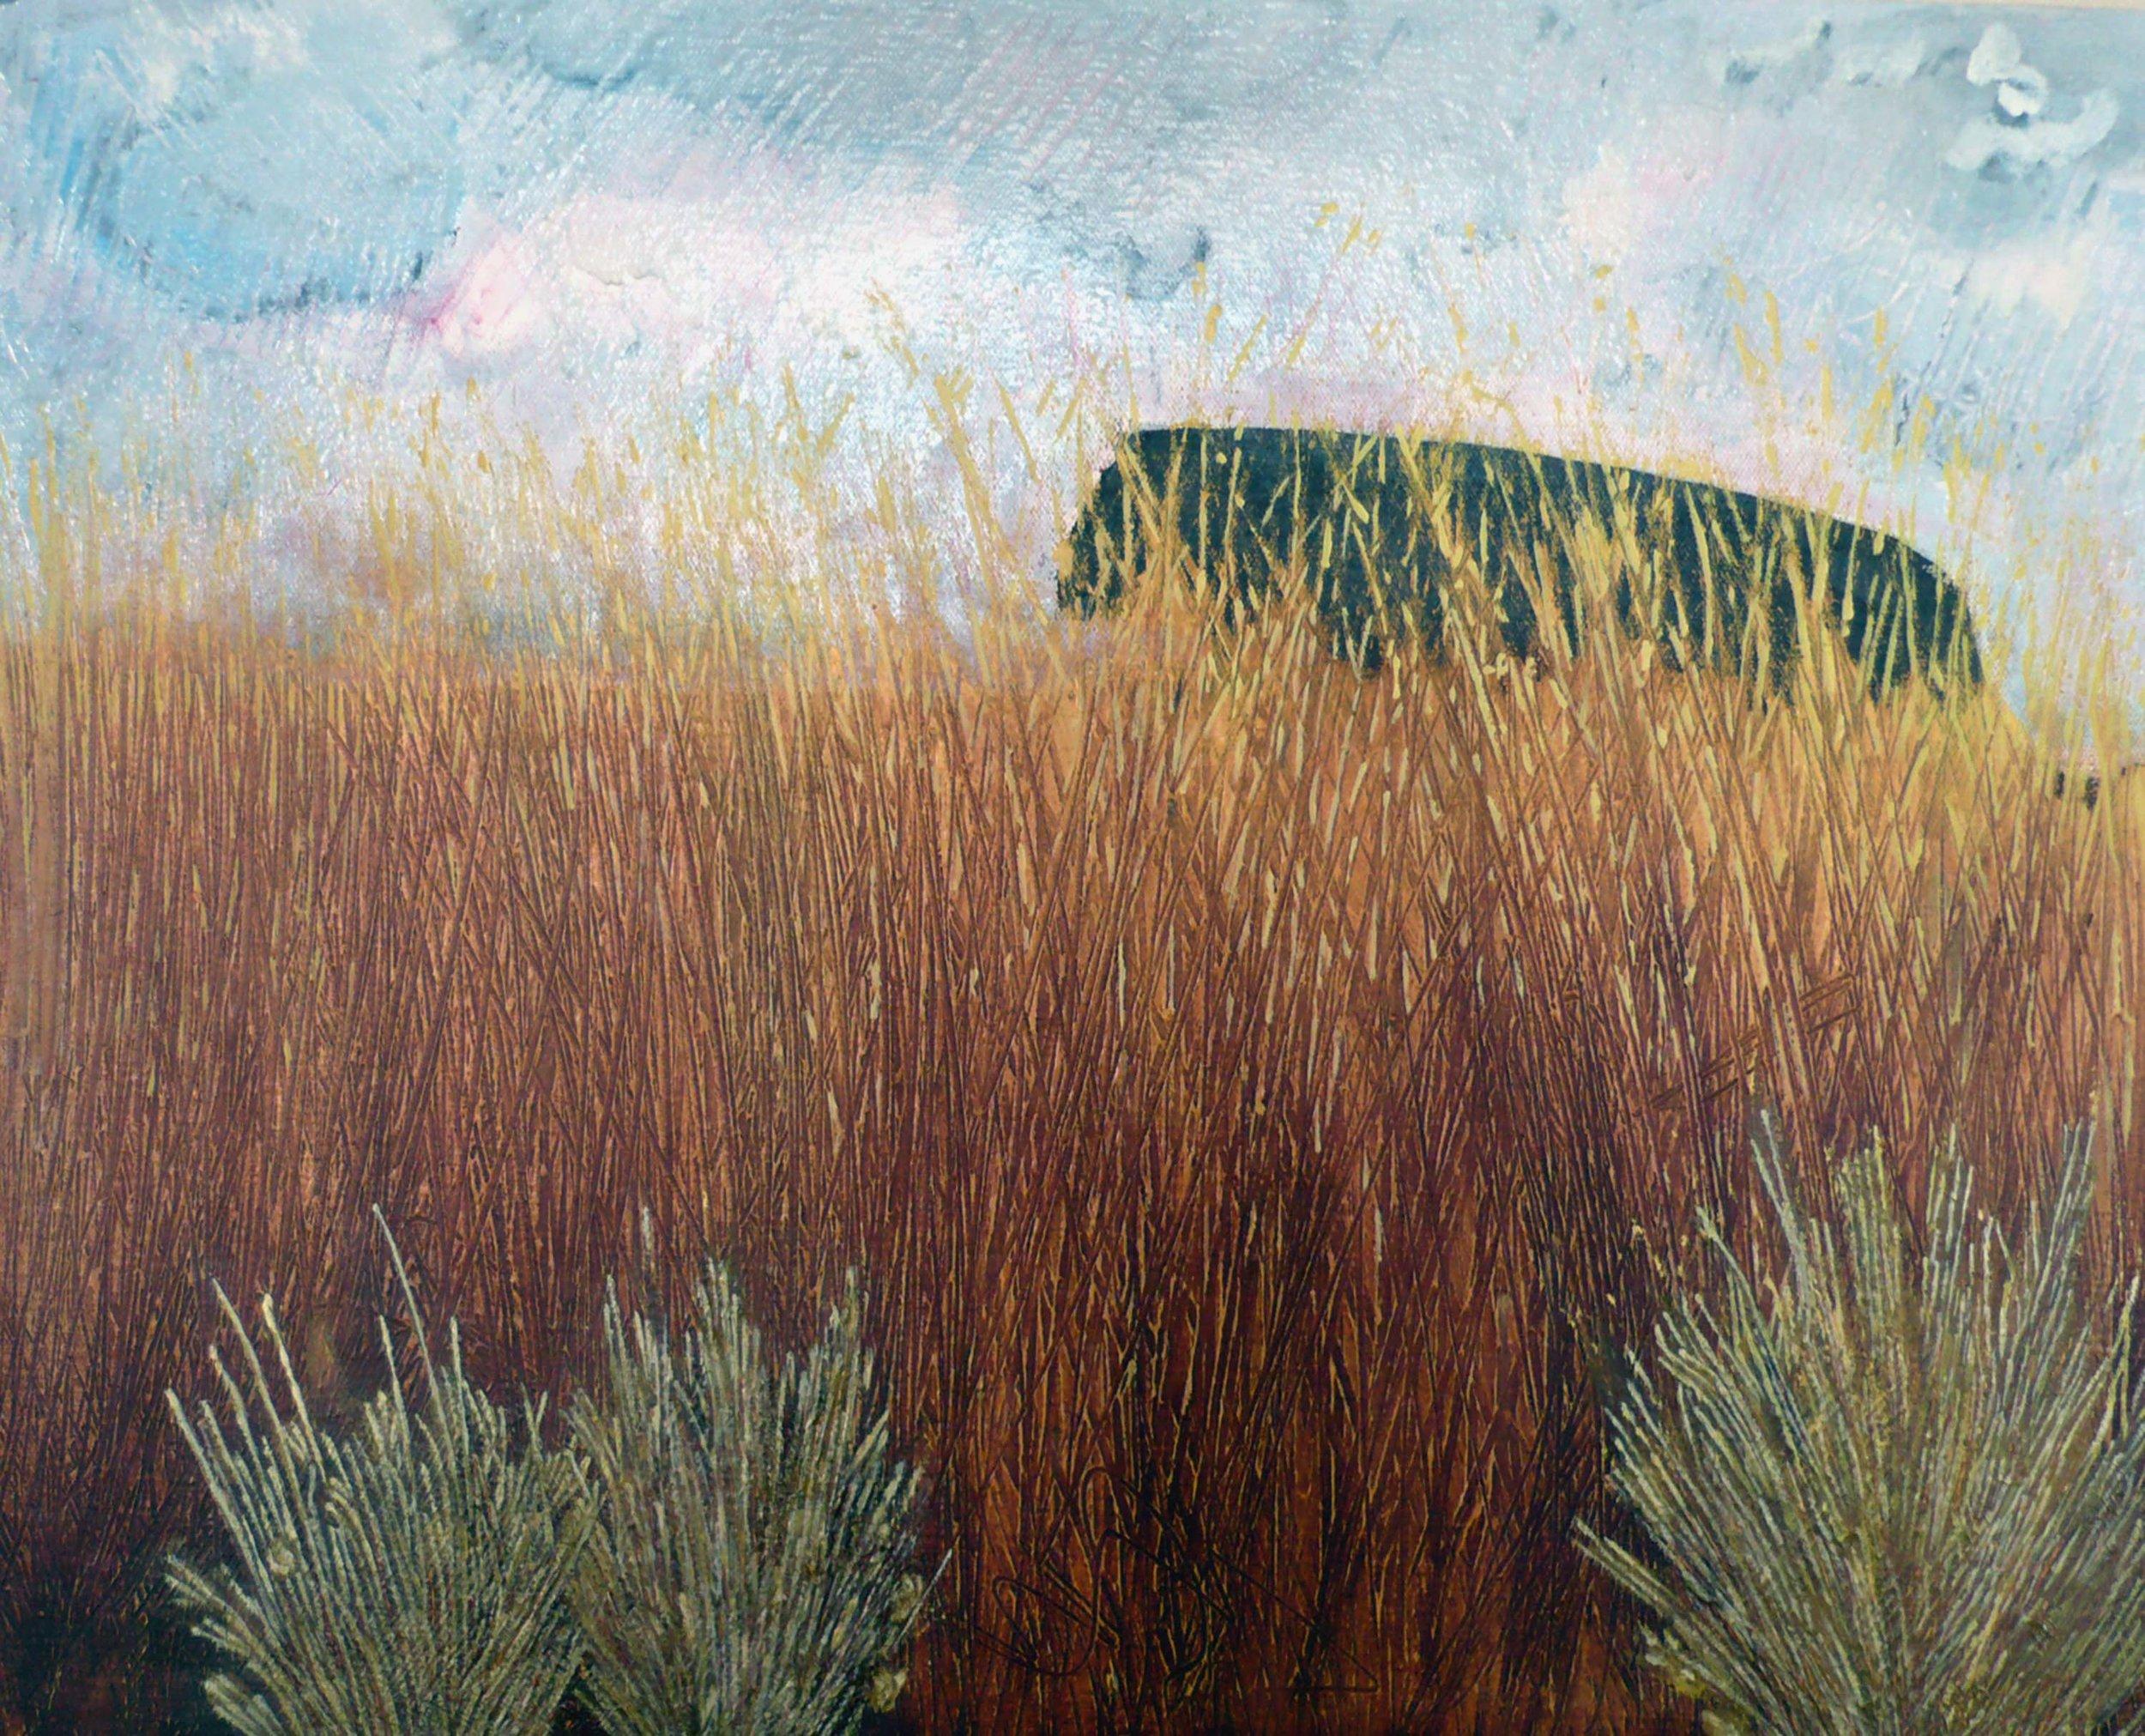 Paysage No 10 , circa 2008, huile sur toile / oil on canvas